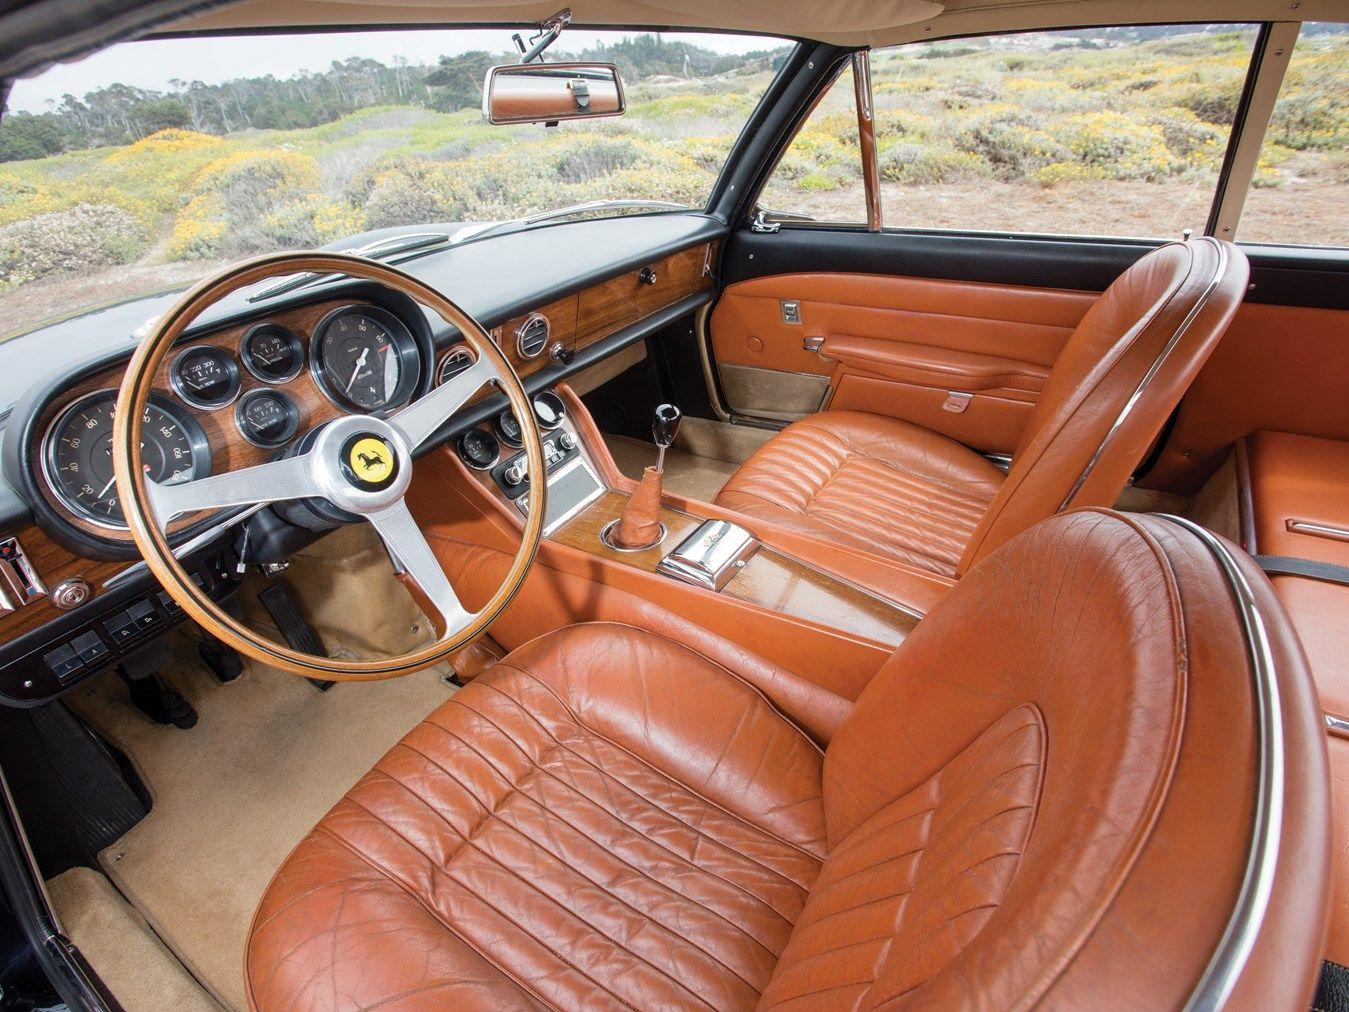 Rm Sotheby S 1964 Ferrari 500 Superfast Series I By Pininfarina Ferrari American Auto Chicago Auto Show